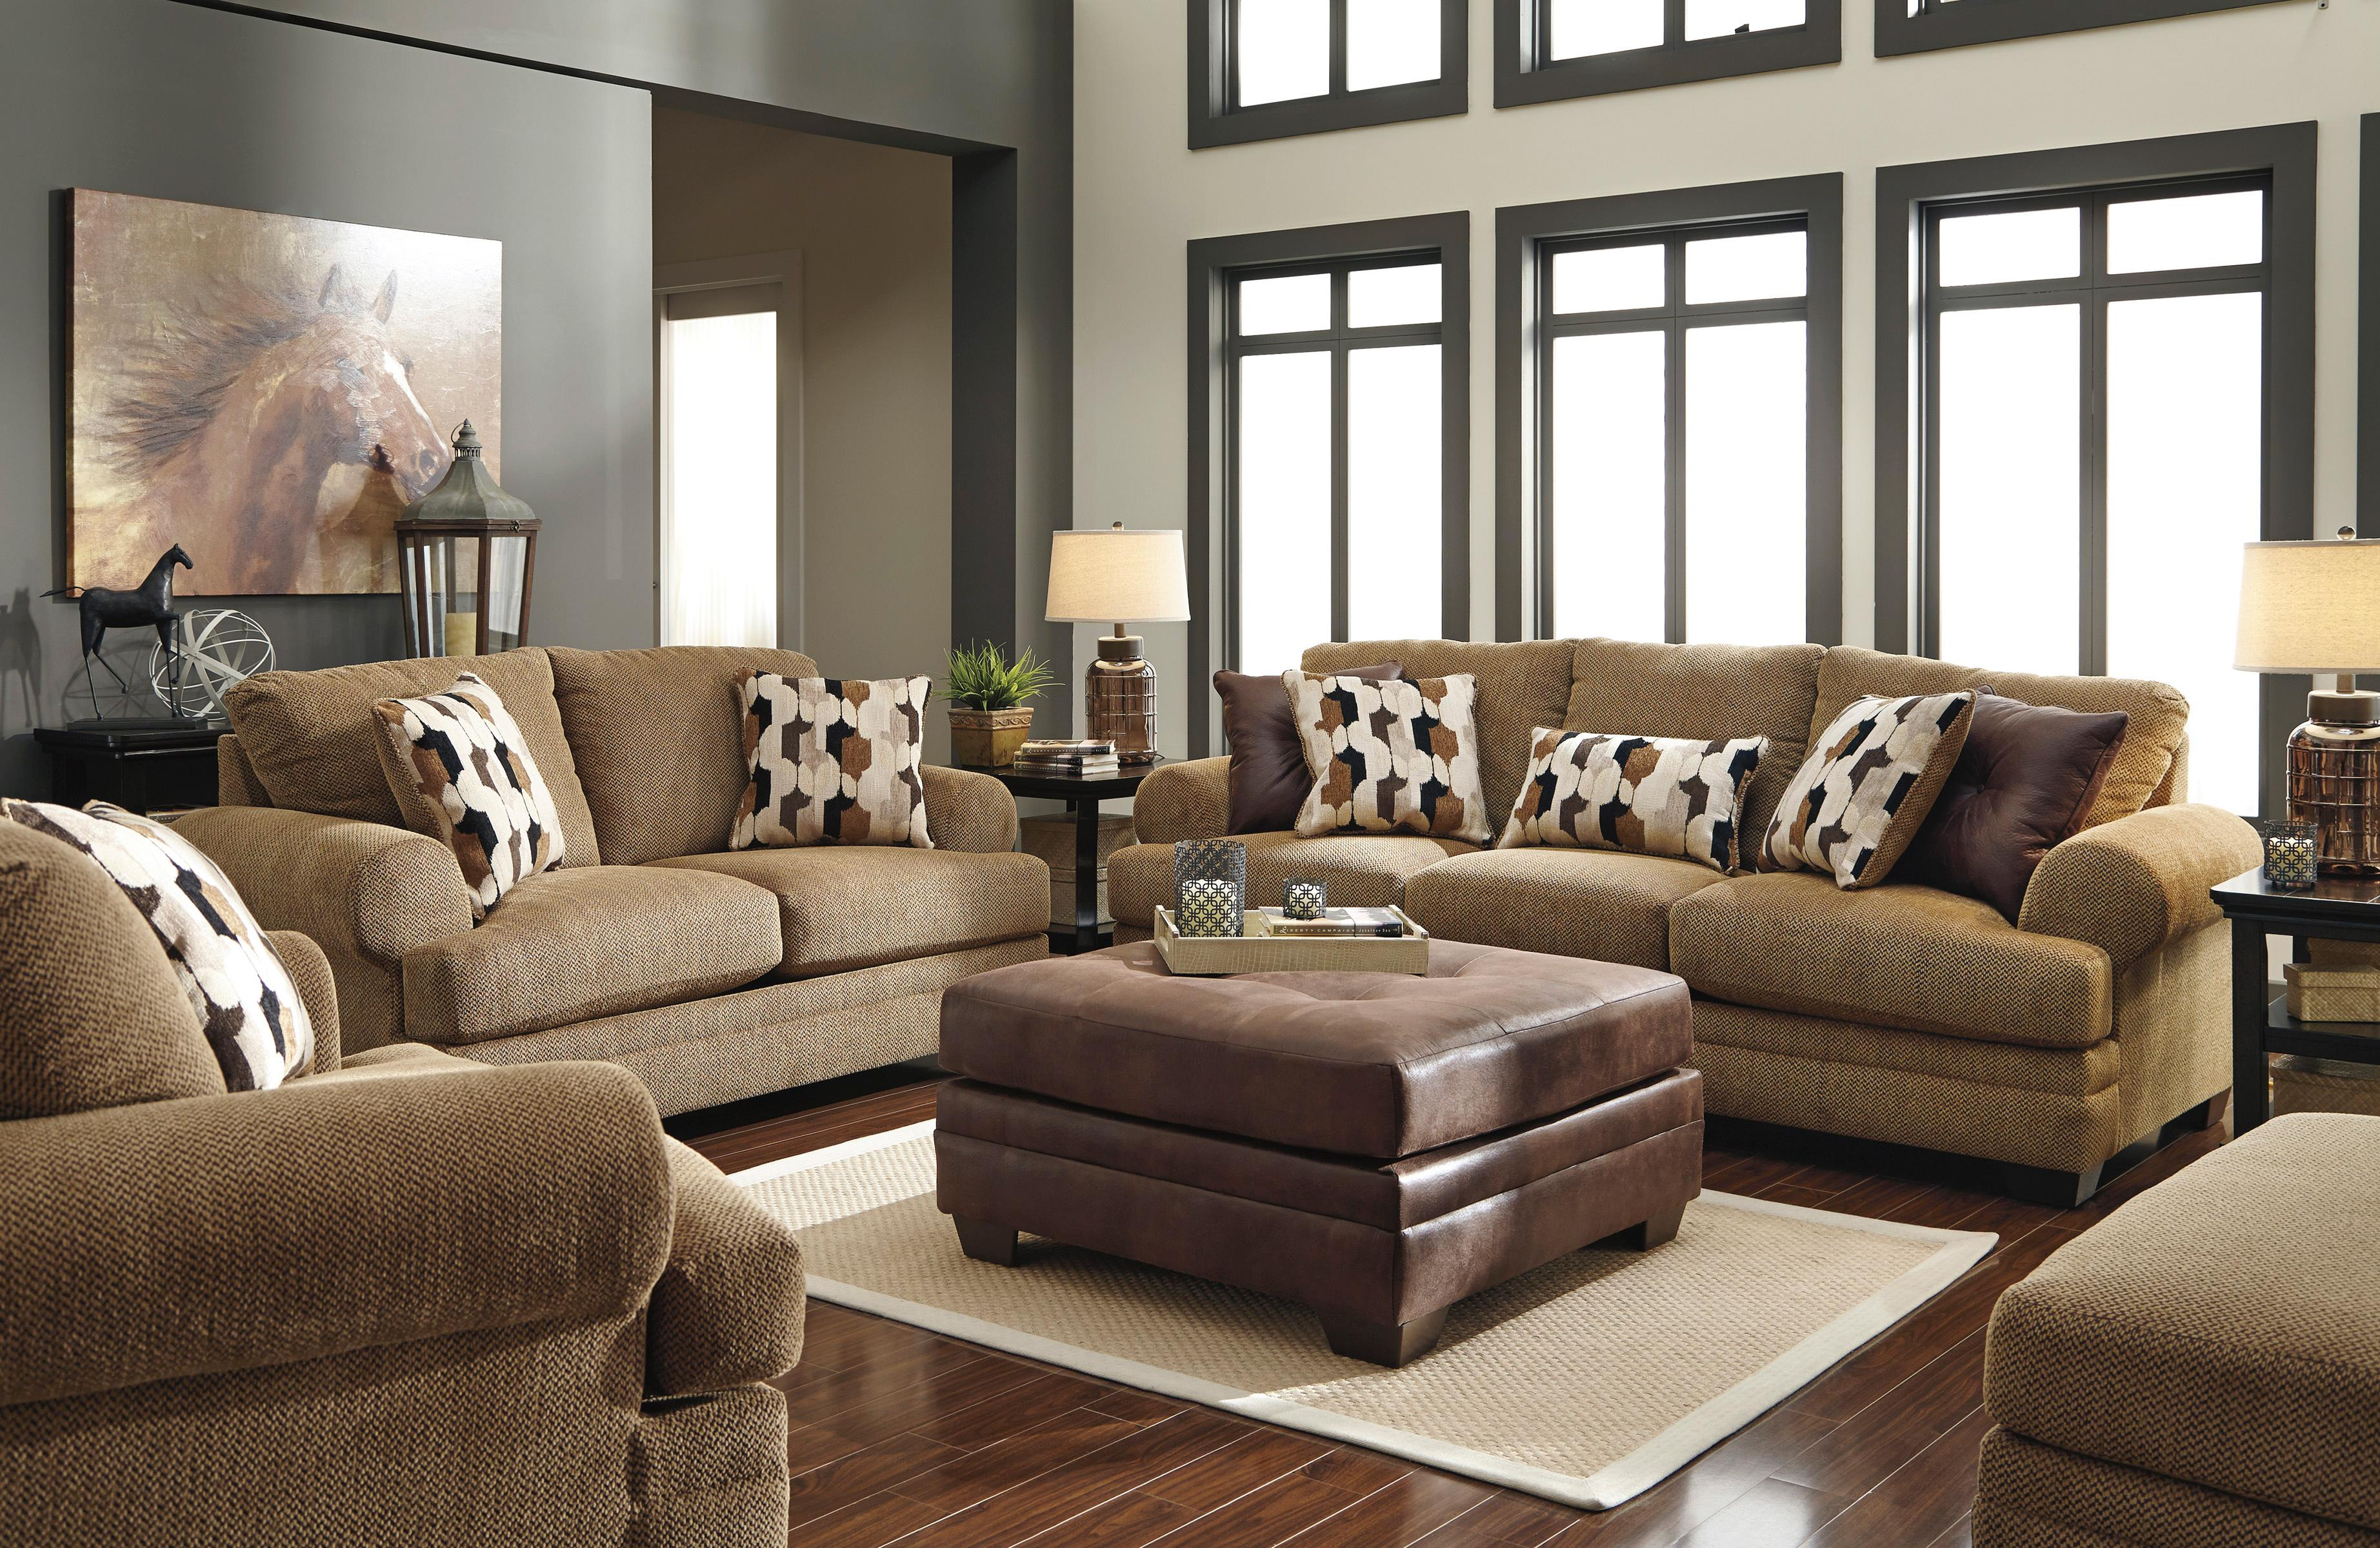 Signature Design by Ashley Kelemen - Amber Stationary Living Room Group - Item Number: 47100 Living Room Group 6